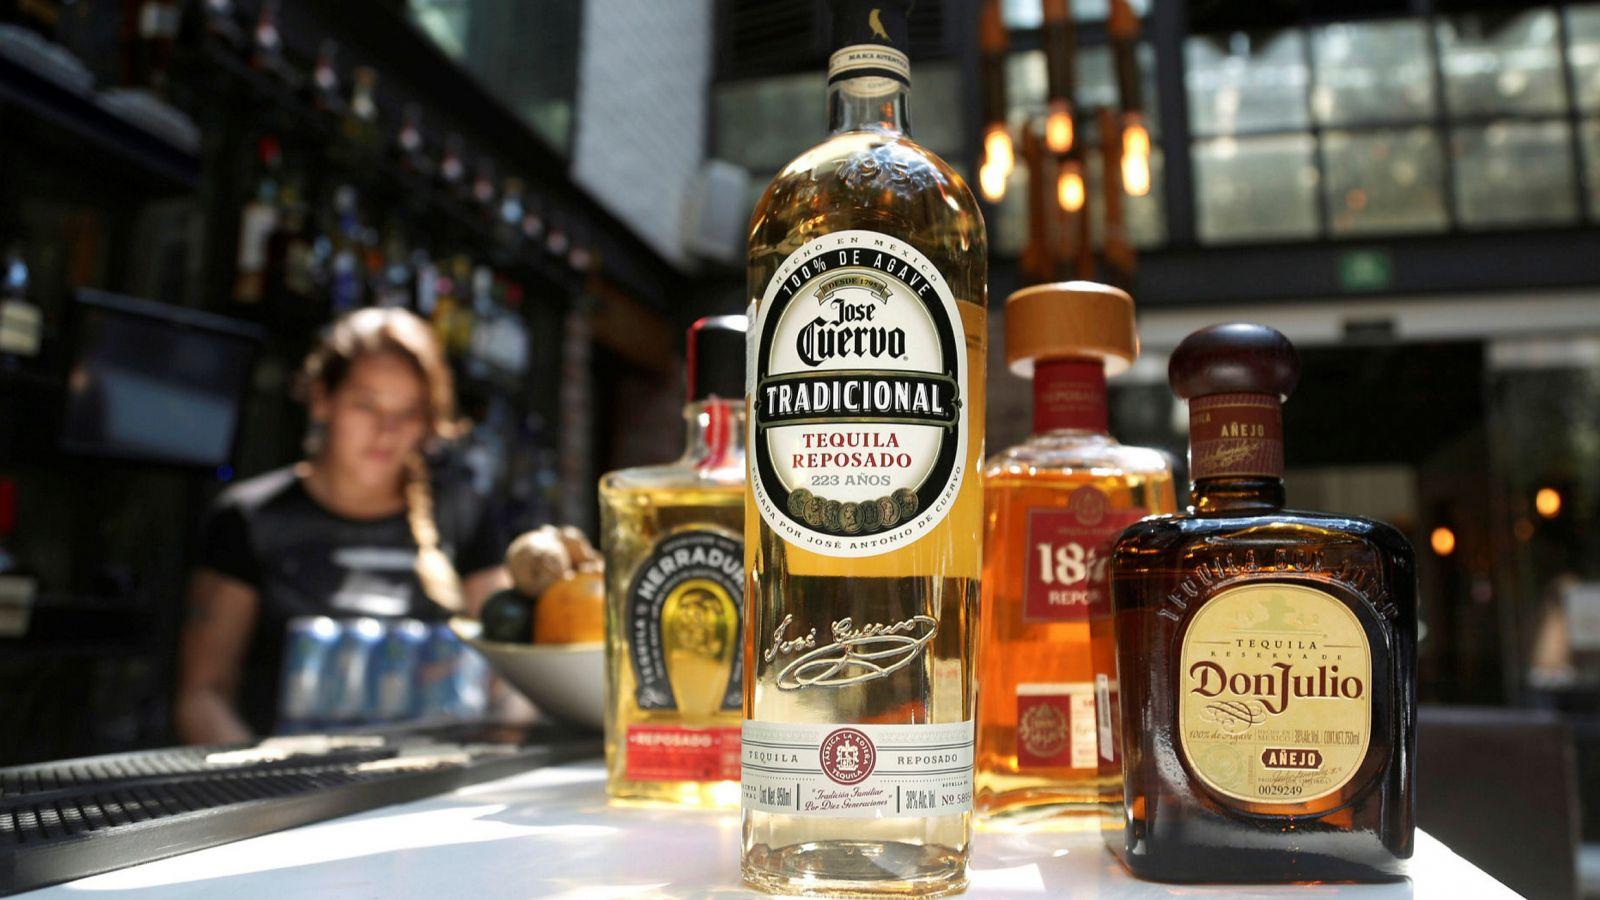 4 claves para identificar un tequila falso